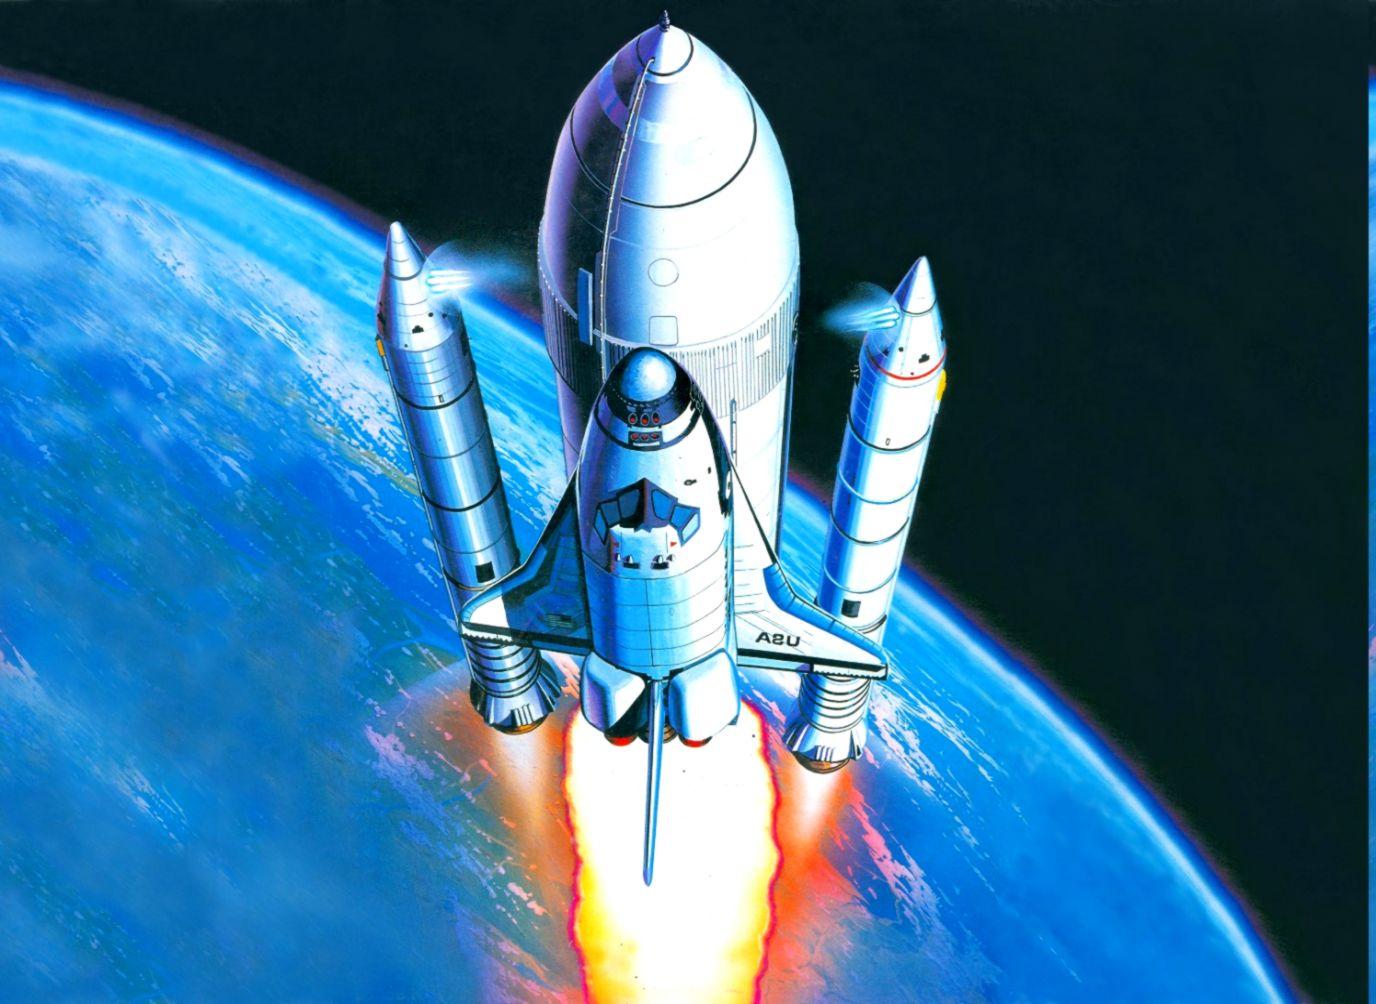 shuttle art  Fantasy Space Shuttle Art Wallpaper | Wallpapers Comp